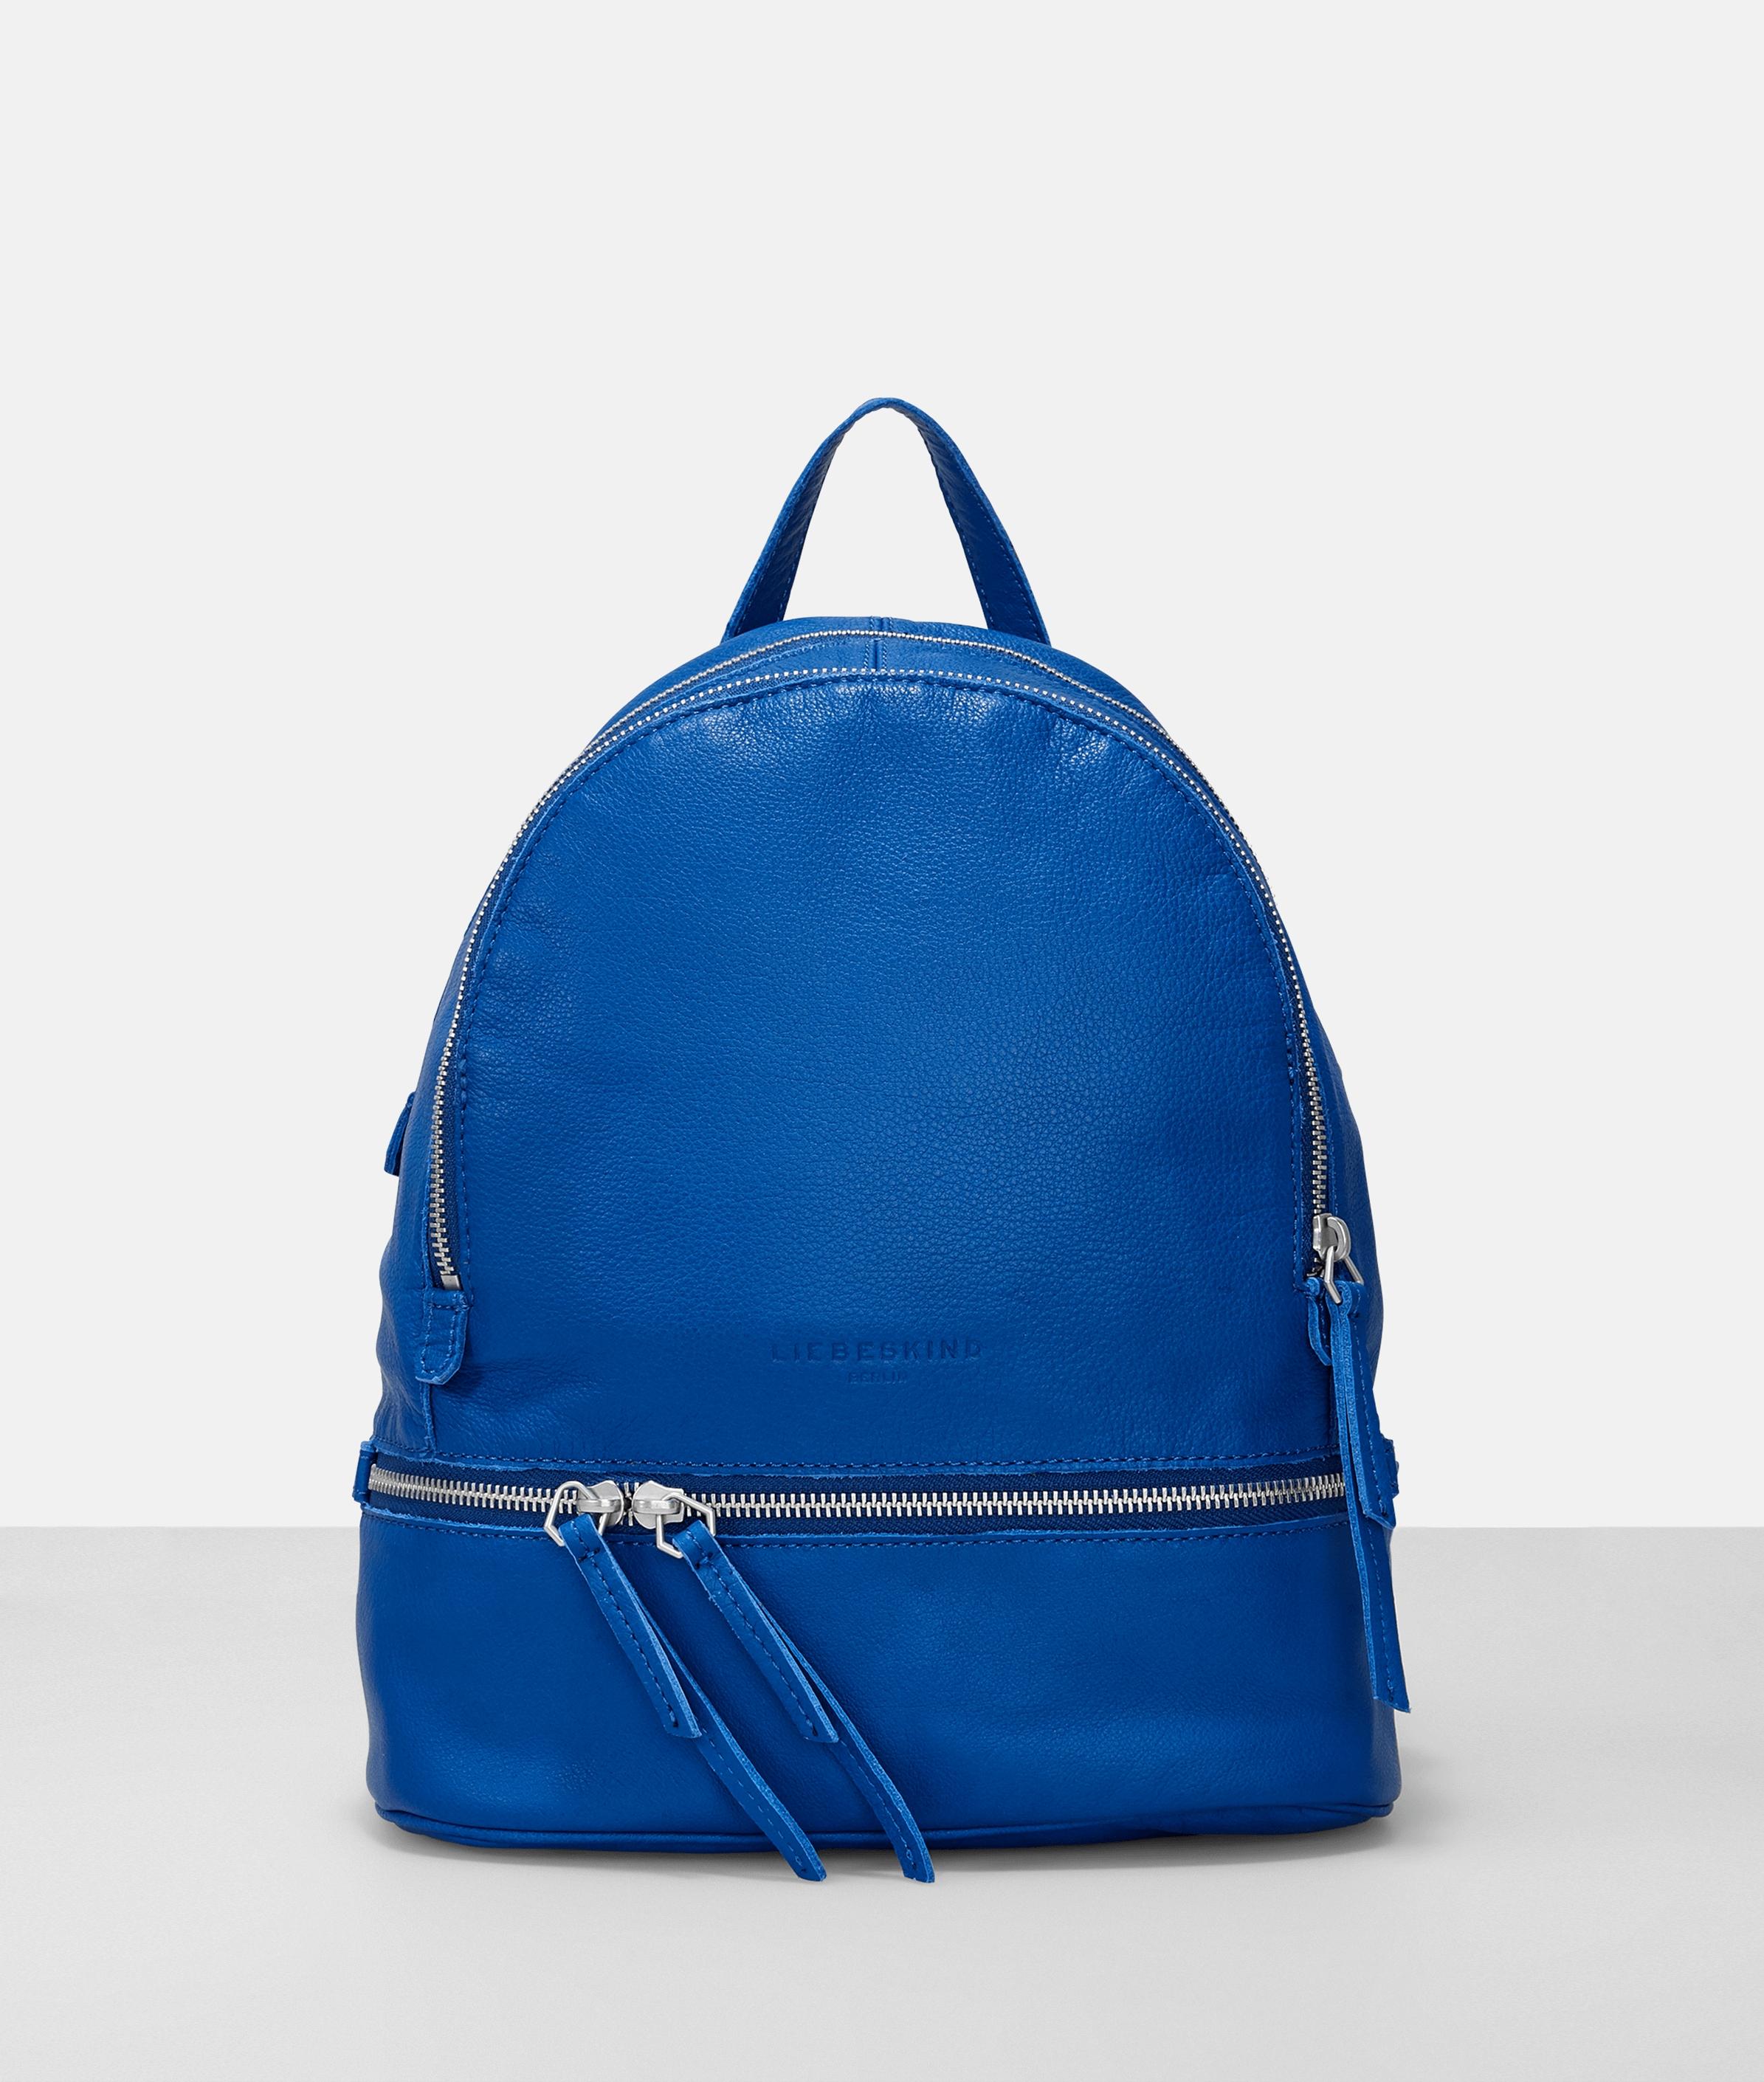 Berlin Tasche Lotta 7, Blau